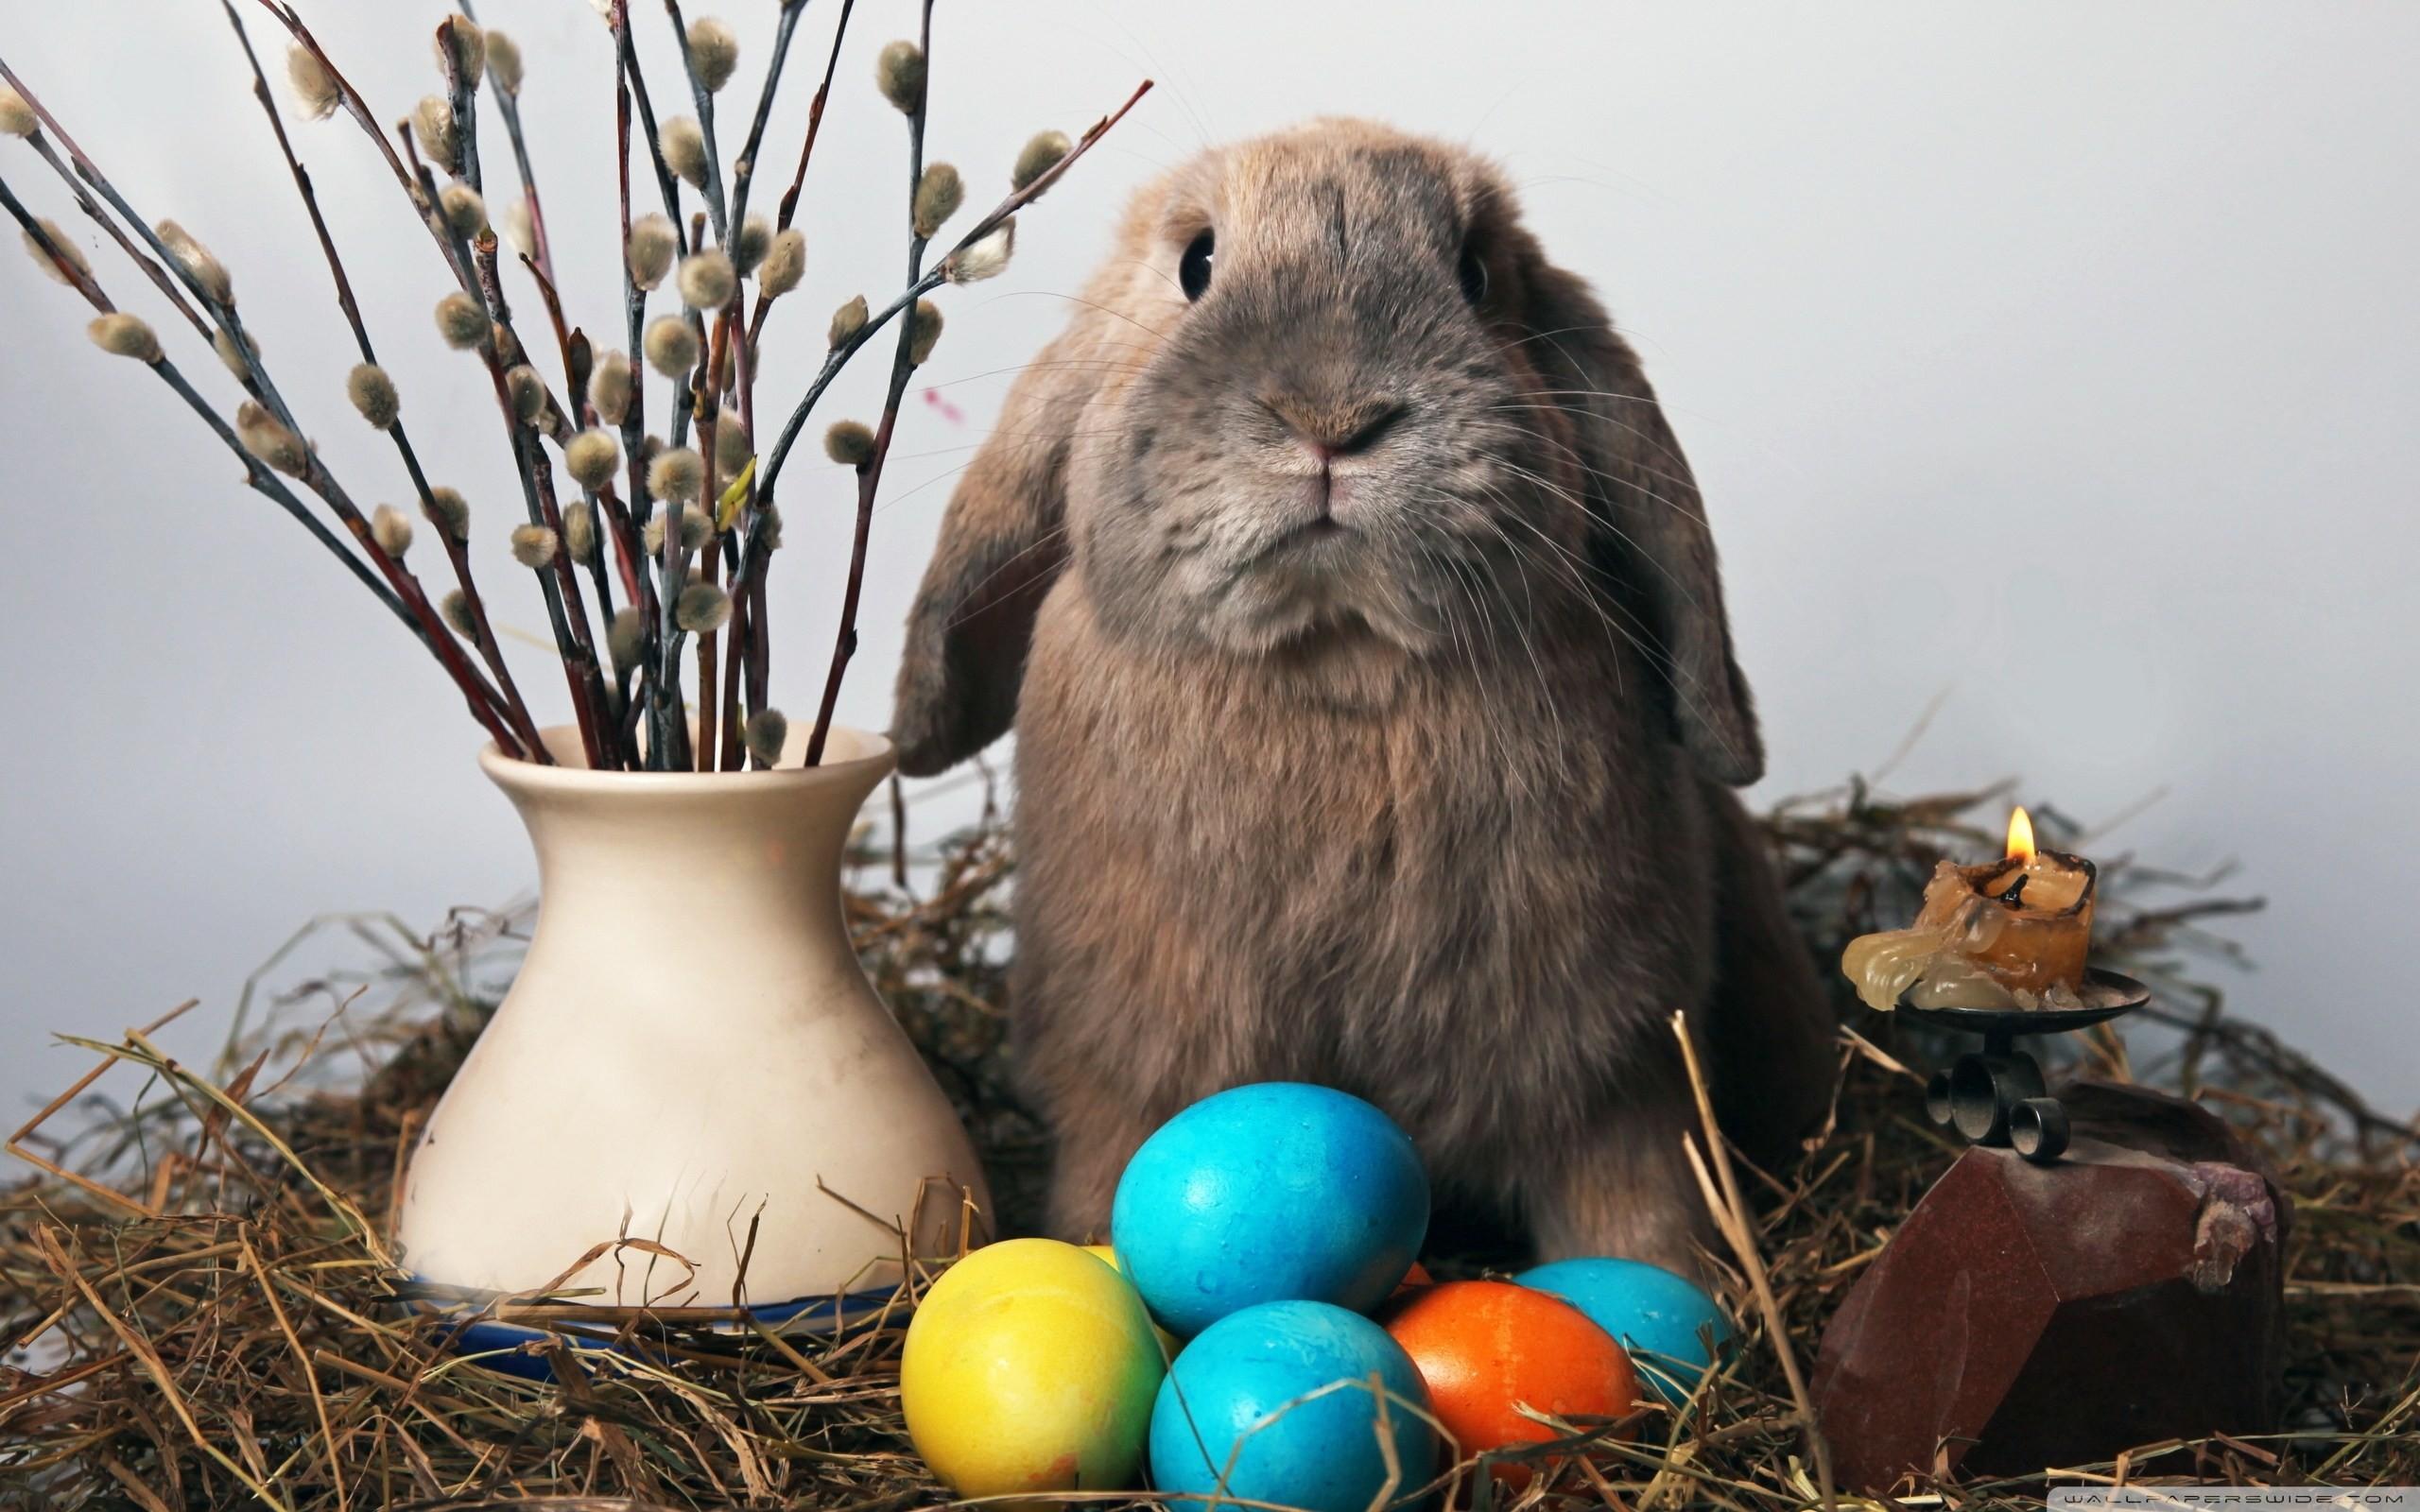 Easter Bunny Hd Desktop Wallpaper High Definition Fullscreen